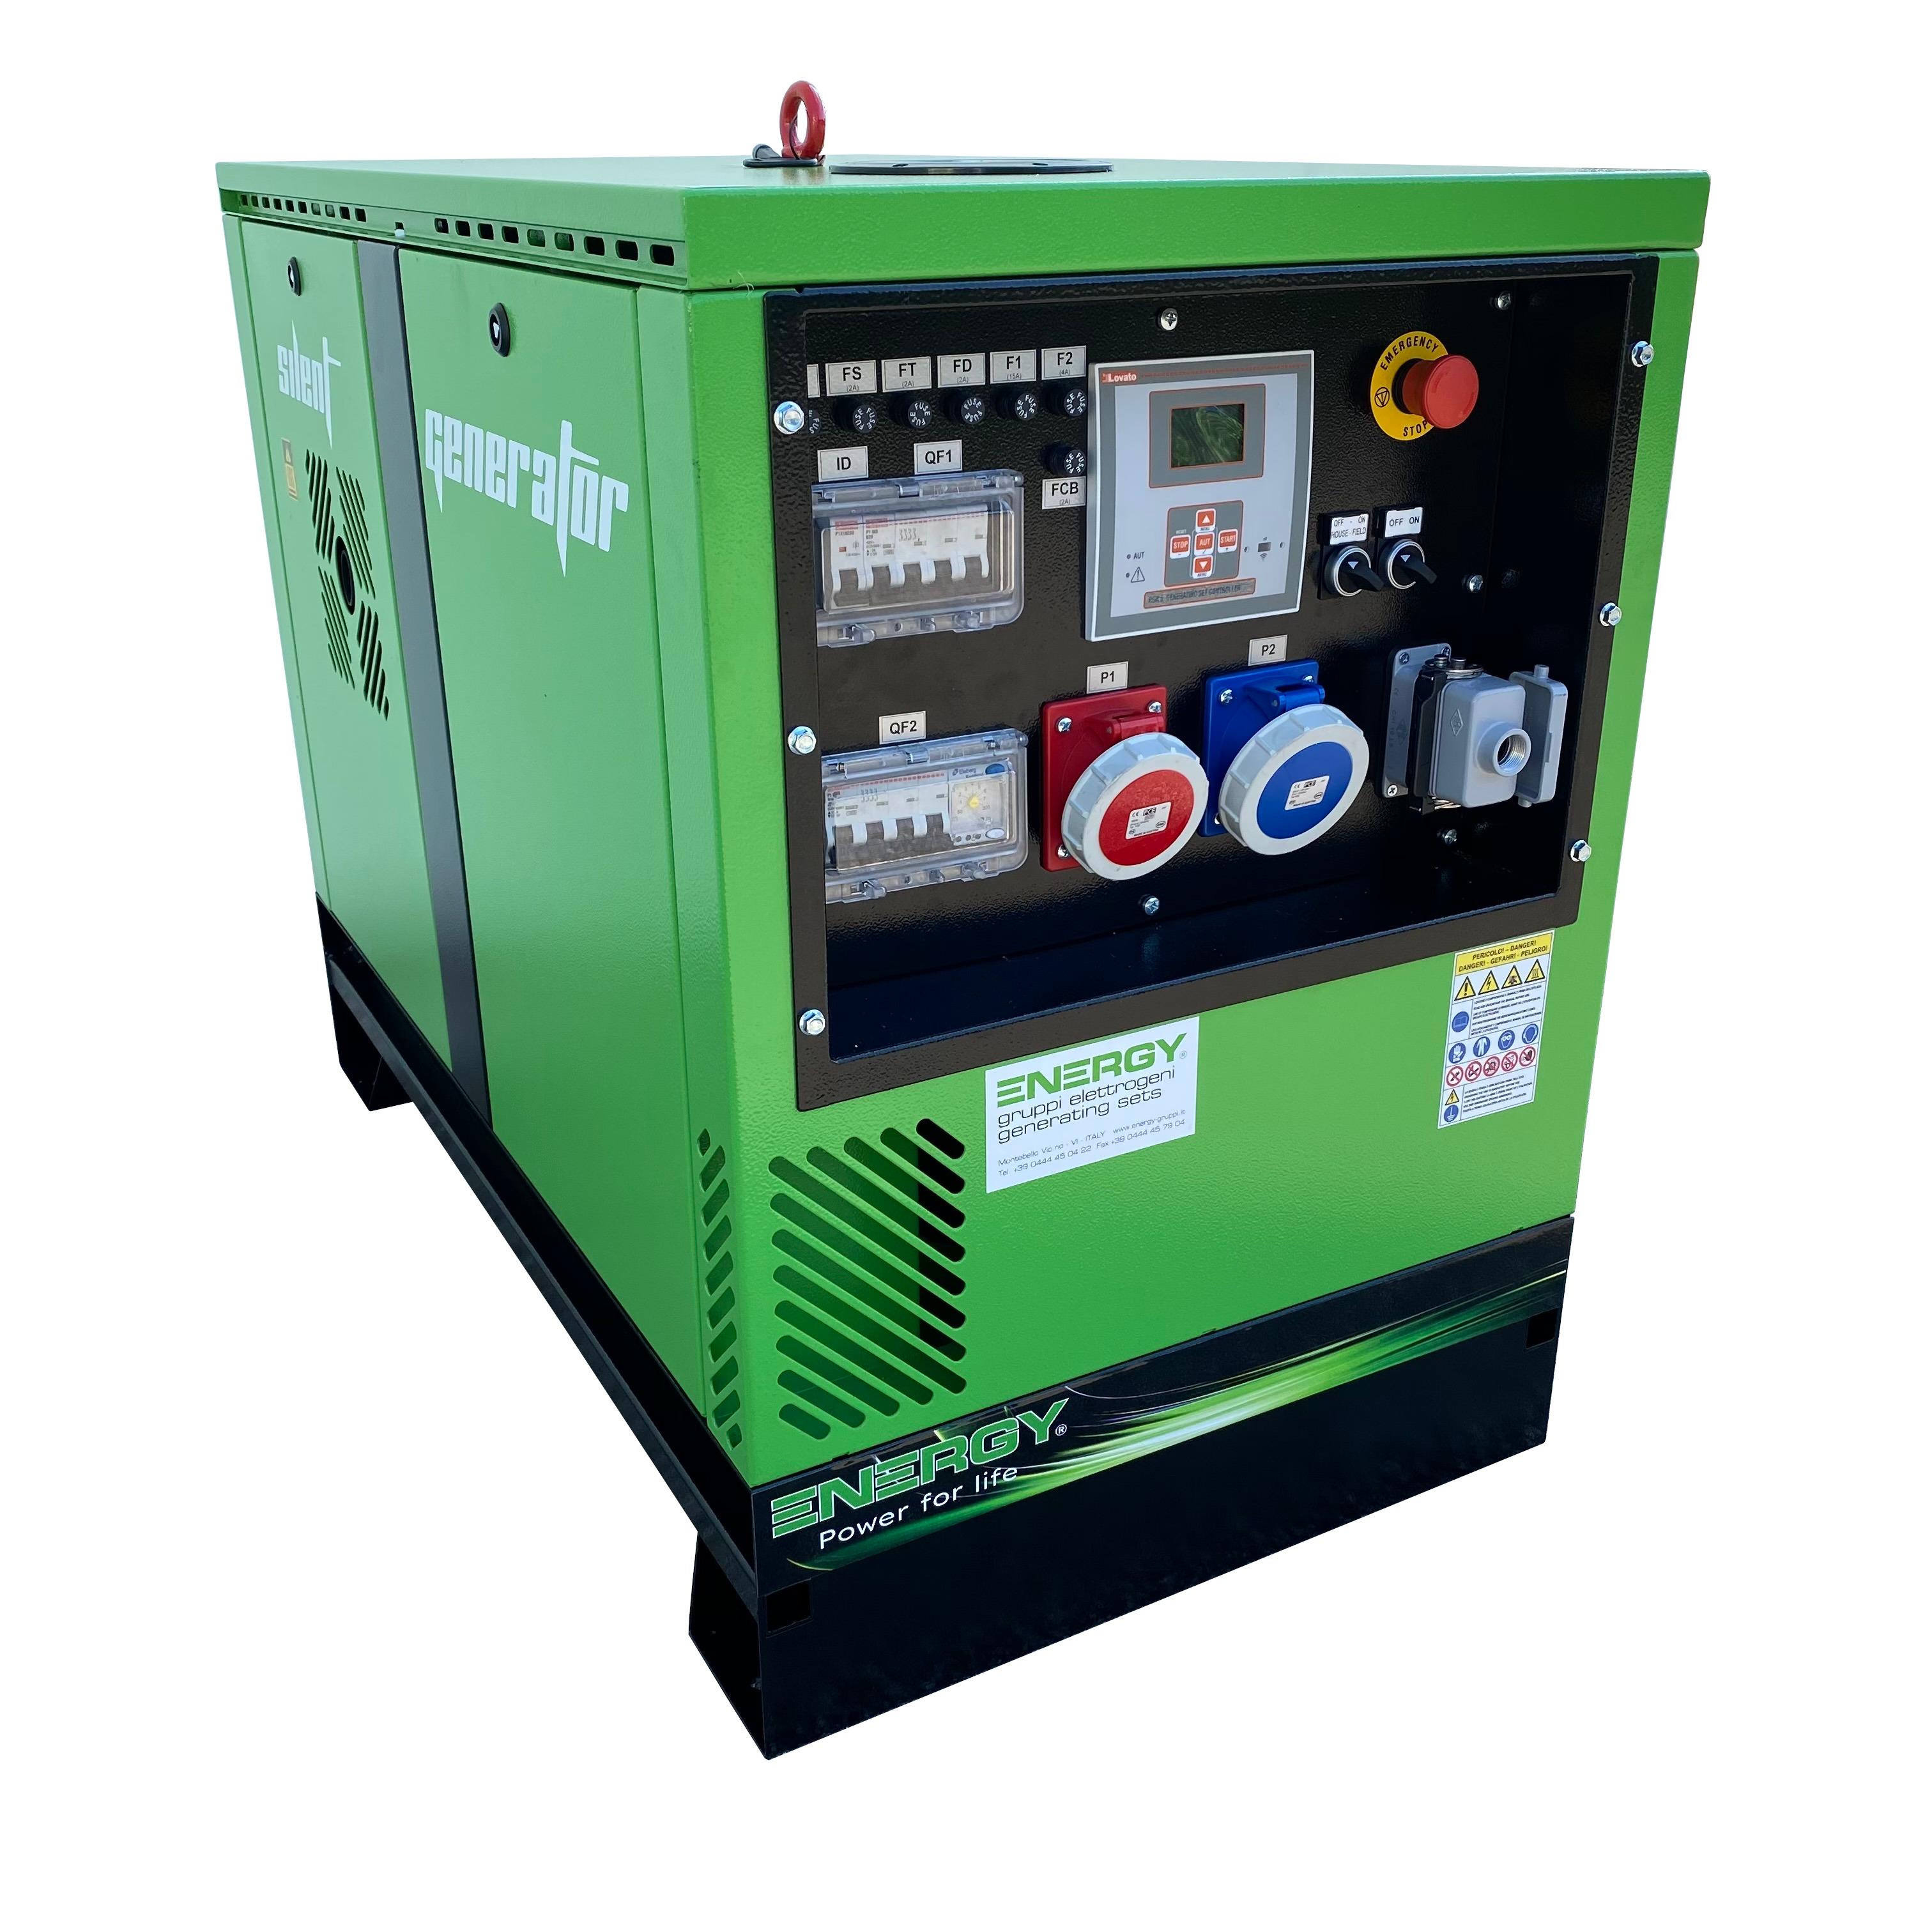 ENERGY Diesel Stromerzeuger 12,2 kVA 400V ADEY-12,5TDE-SA Stromaggregat